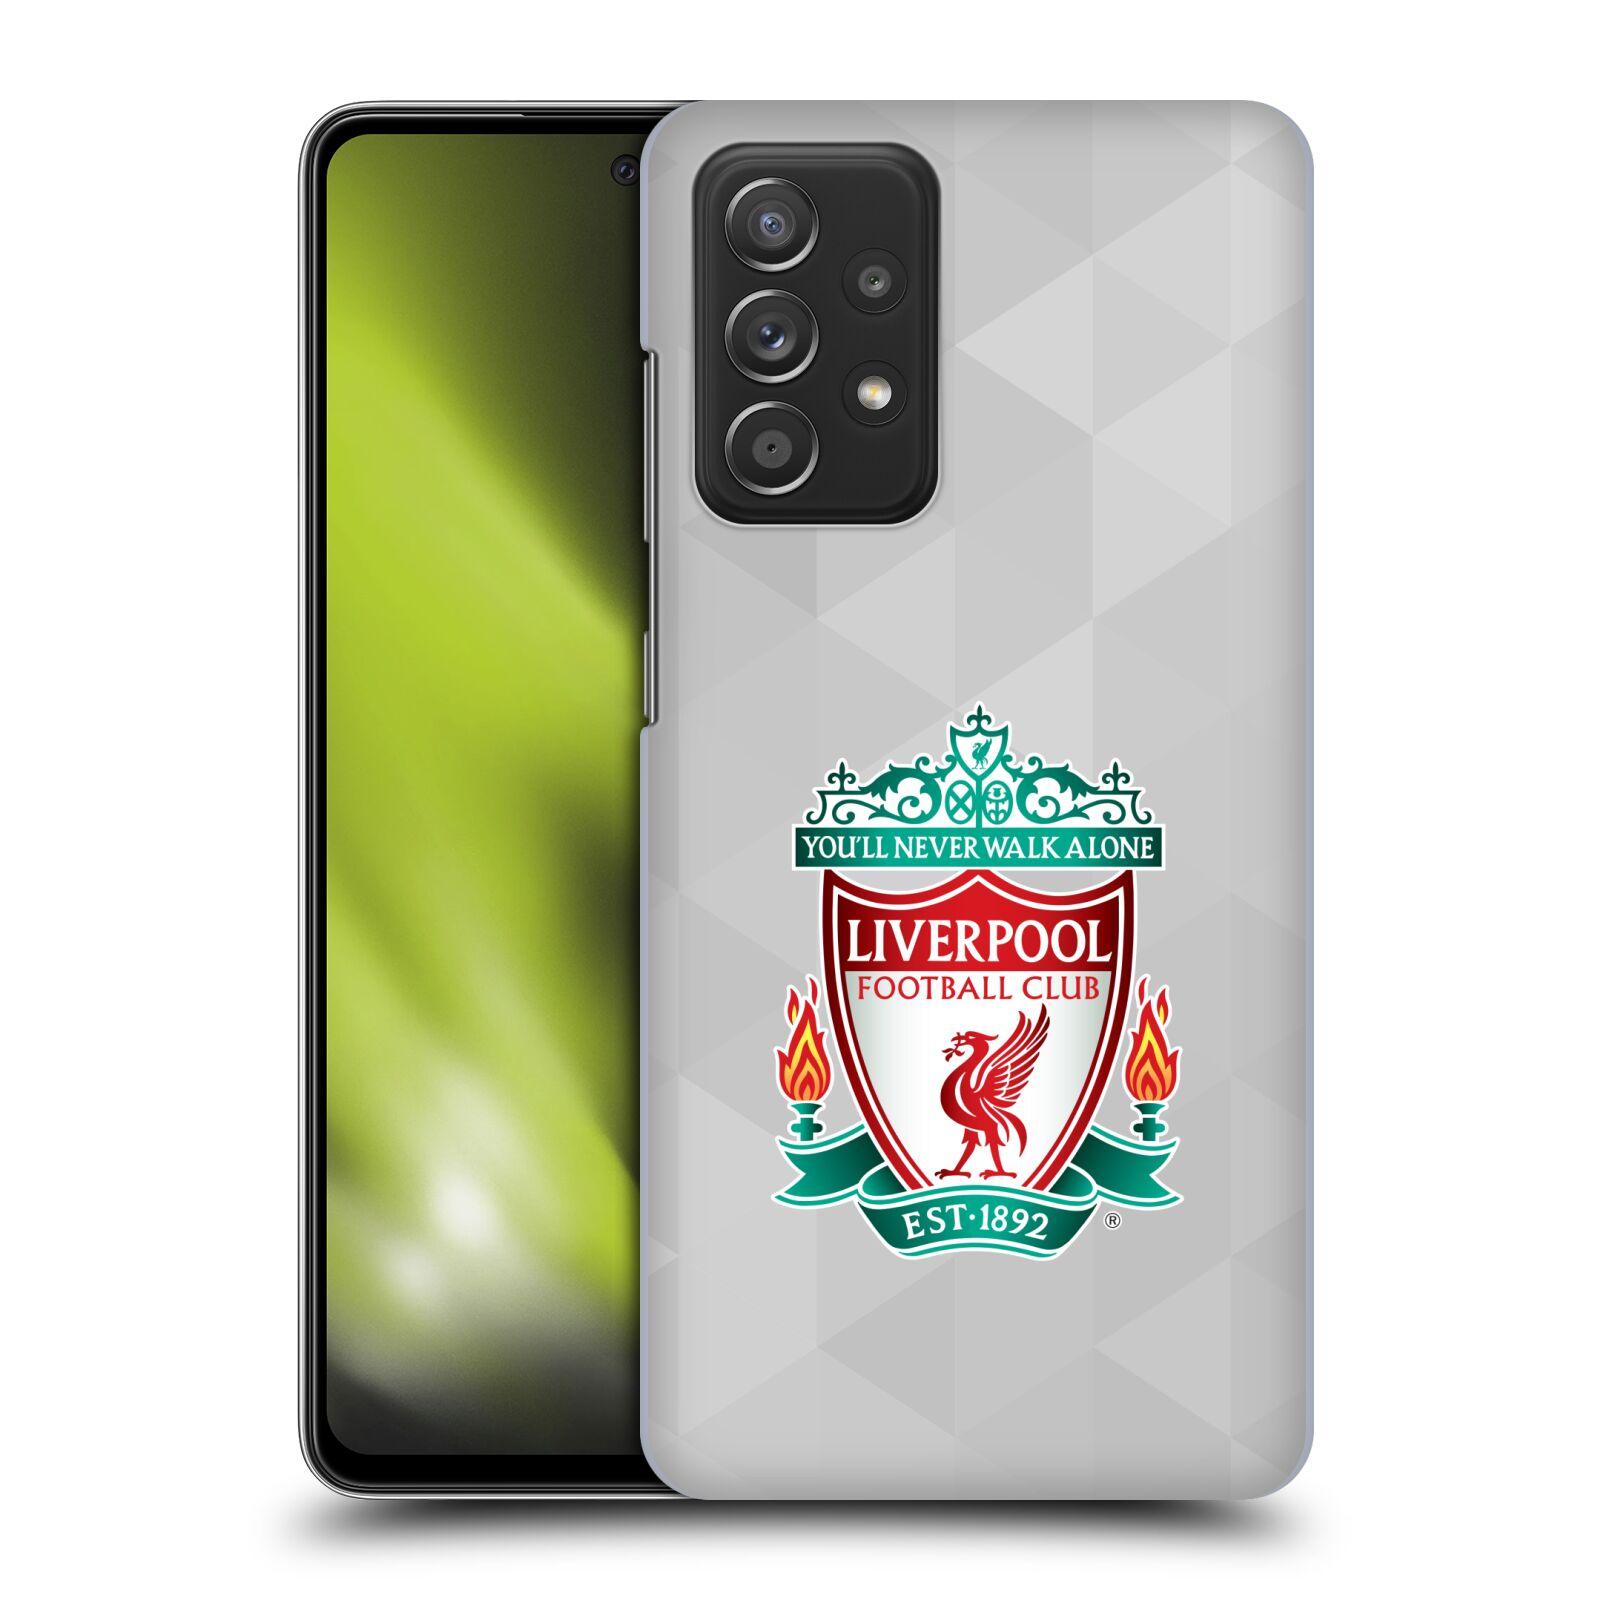 Plastové pouzdro na mobil Samsung Galaxy A52 / A52 5G / A52s 5G - Head Case - ZNAK LIVERPOOL FC OFFICIAL GEOMETRIC WHITE